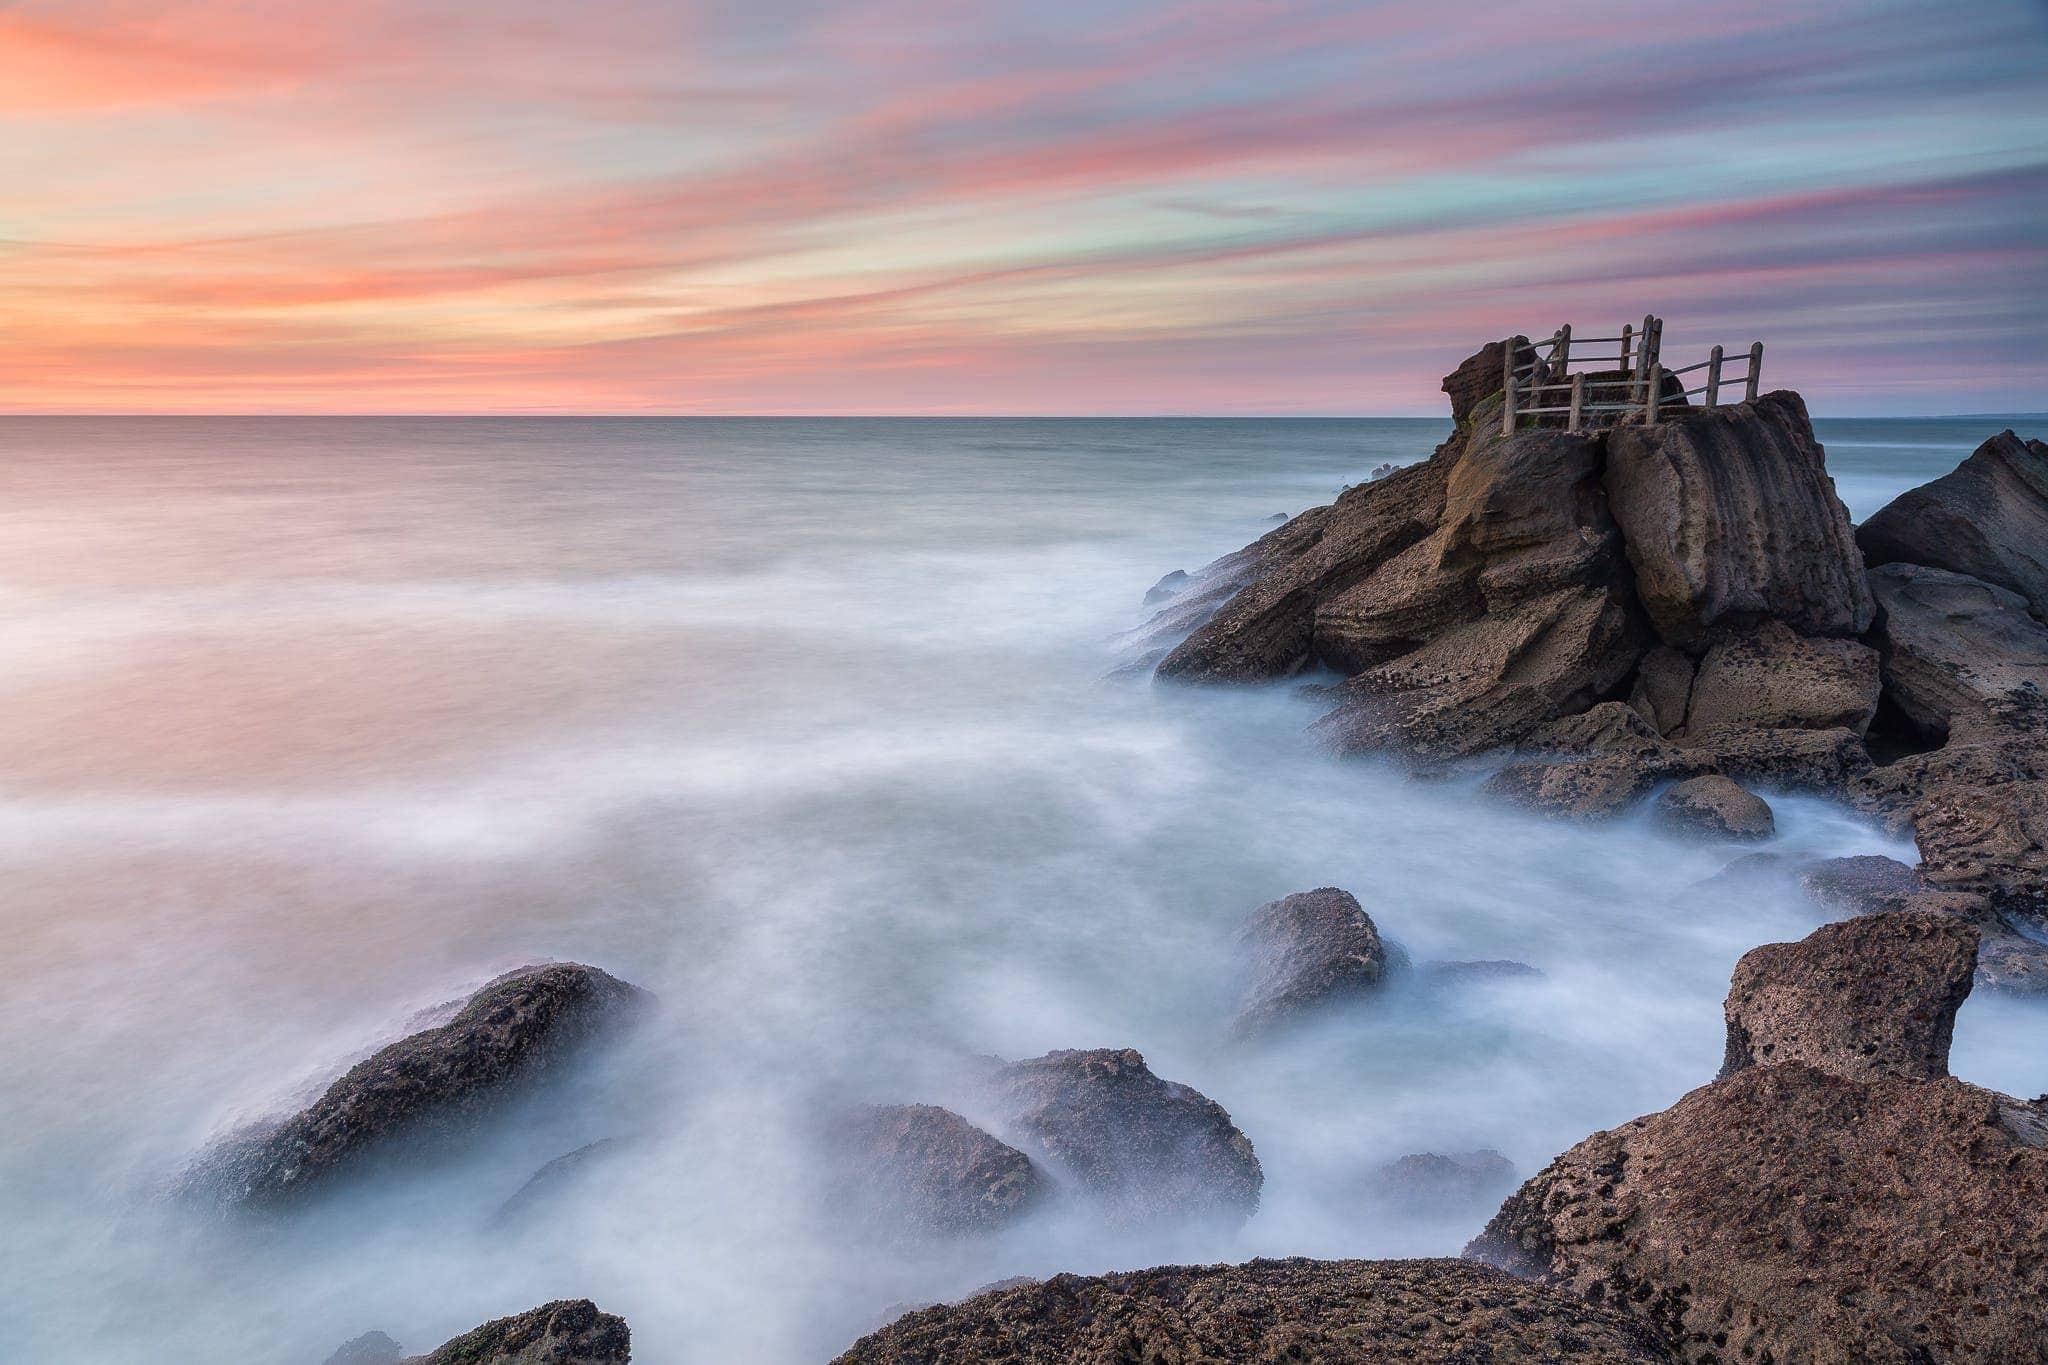 Francesco Gola Seascape Landscape Photography Long Exposure Portugal Santa Cruz Sunset